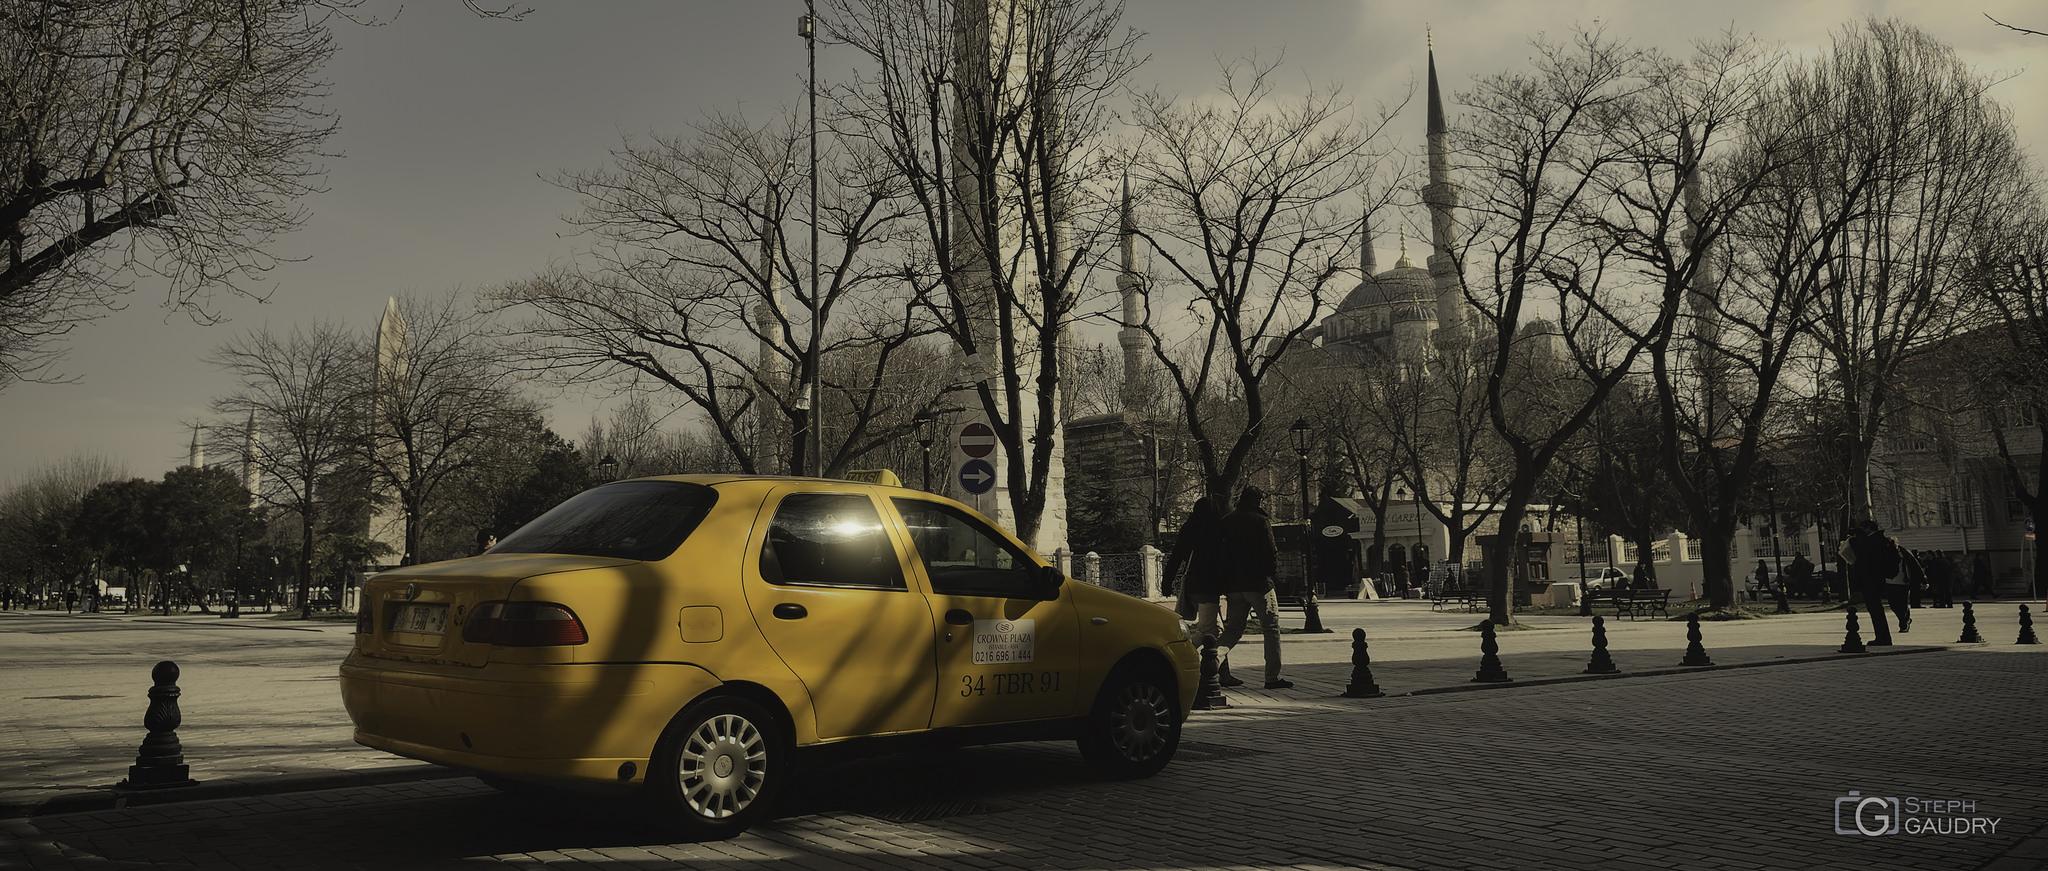 Renkler, sarı taksi ve Sultanahmet Camii [sinemaskop] [Cliquez pour lancer le diaporama]